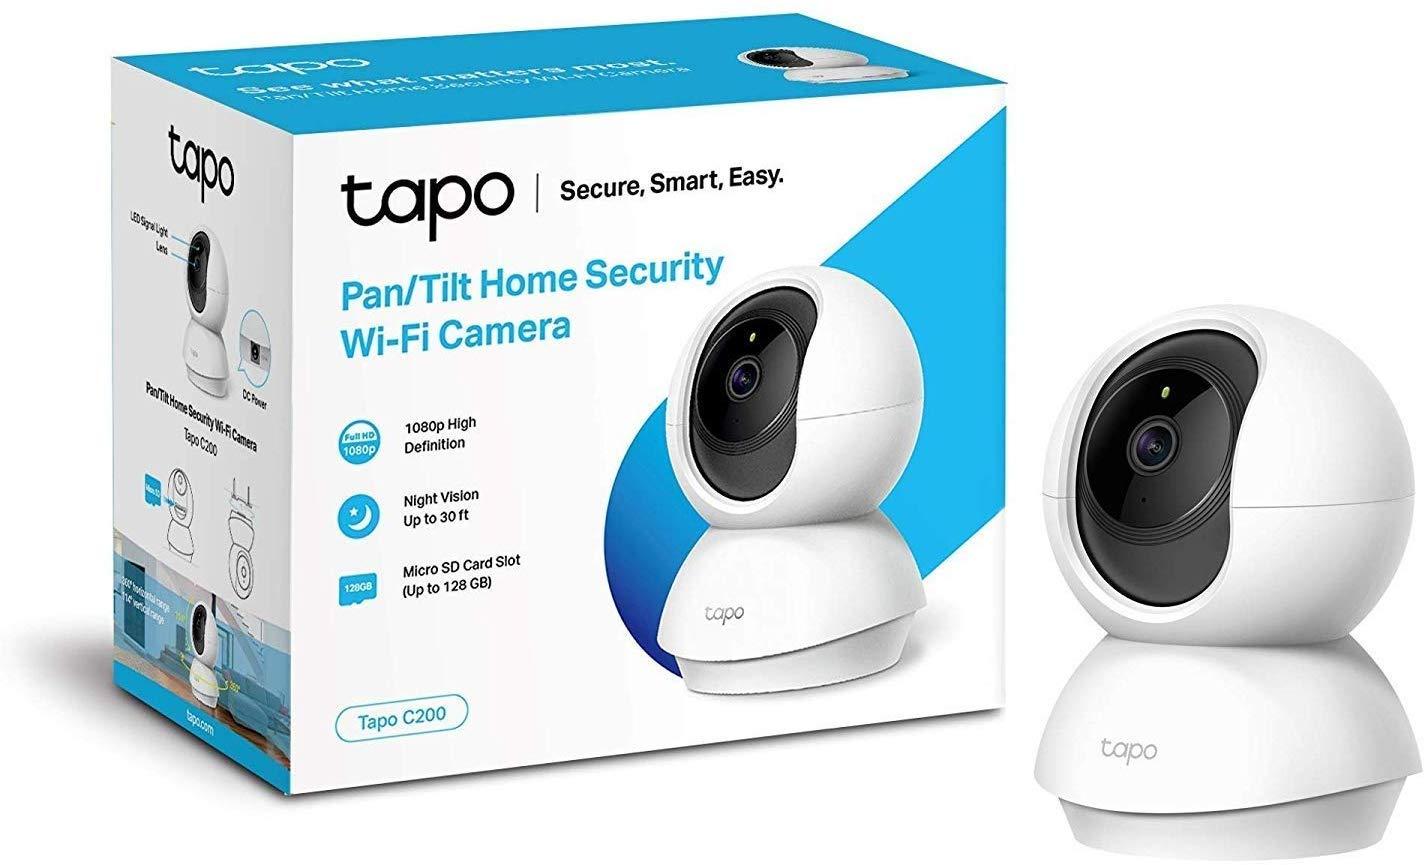 TP-Link Tapo C200 - Cámara Vigilancia, Cámara IP WiFi 1080p Full HD 114° Gran Angular + TP-Link HS100 - Enchufe Inteligente para controlar Sus ...